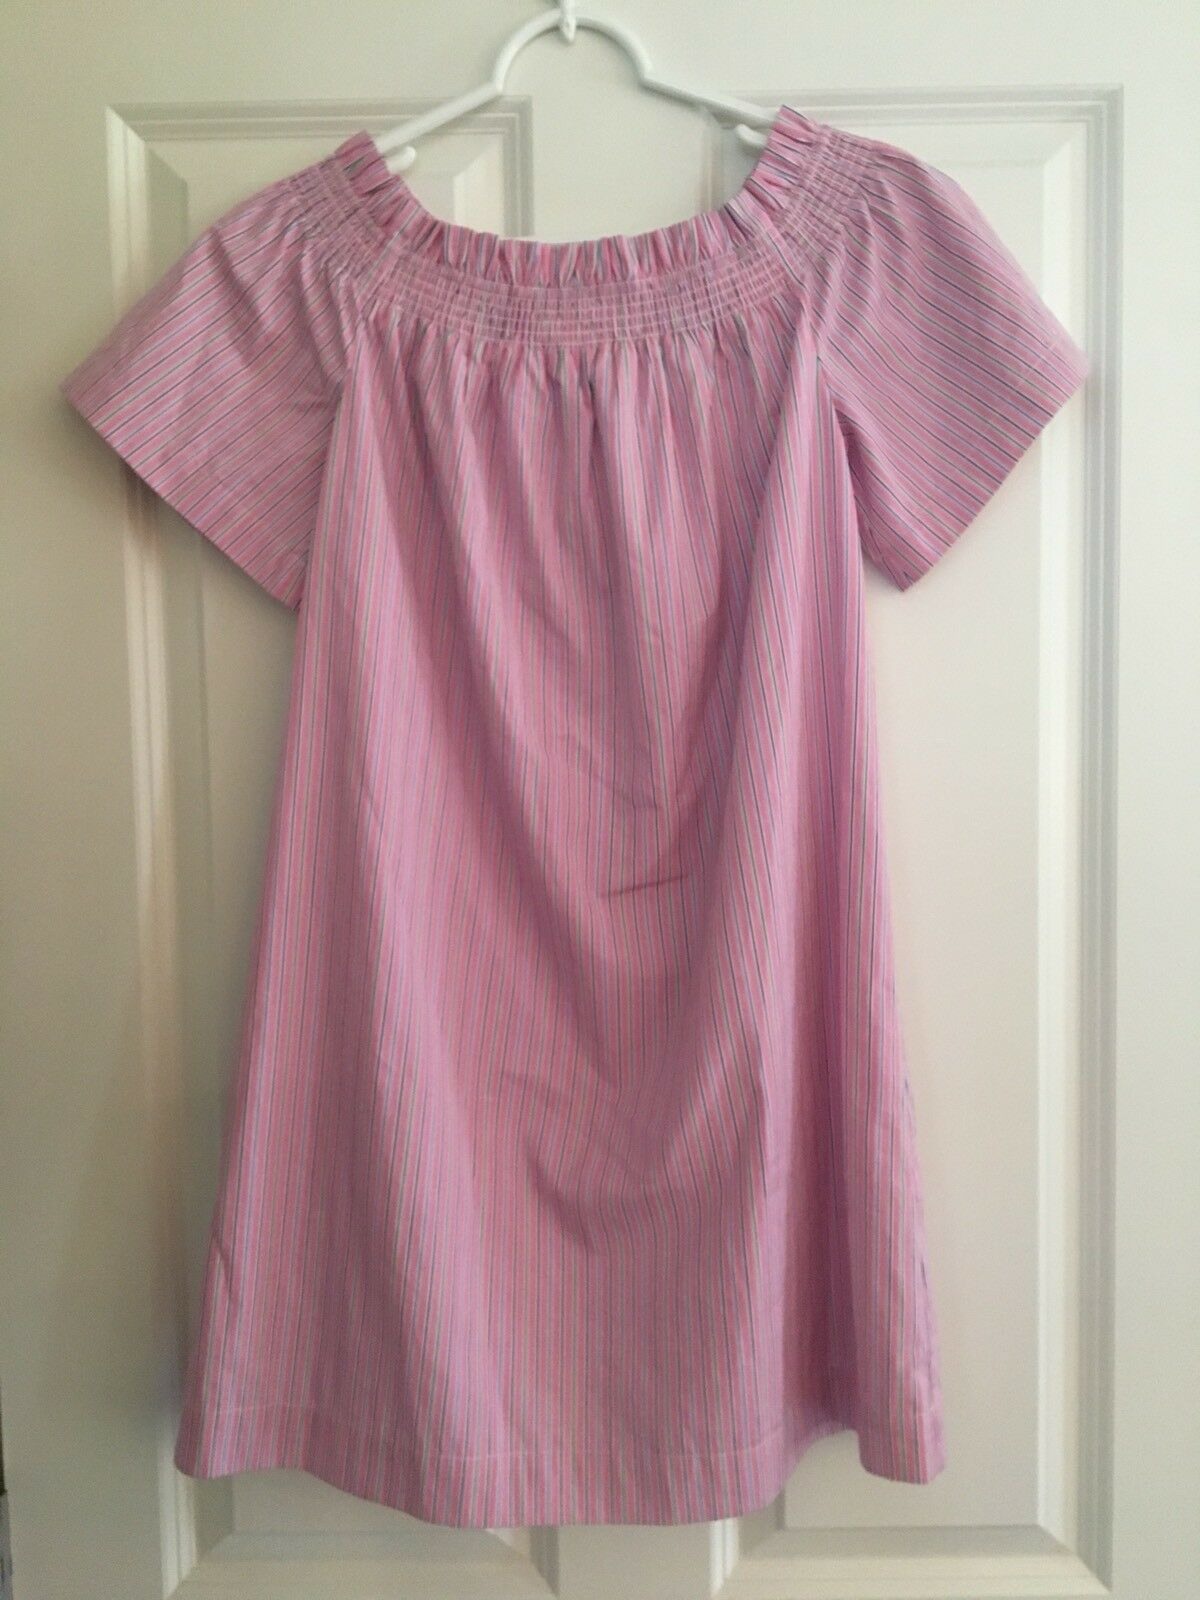 Vineyard Vines Nwt Sz S Pink & bluee Striped Off The Shoulder Dress Msrp 128.00